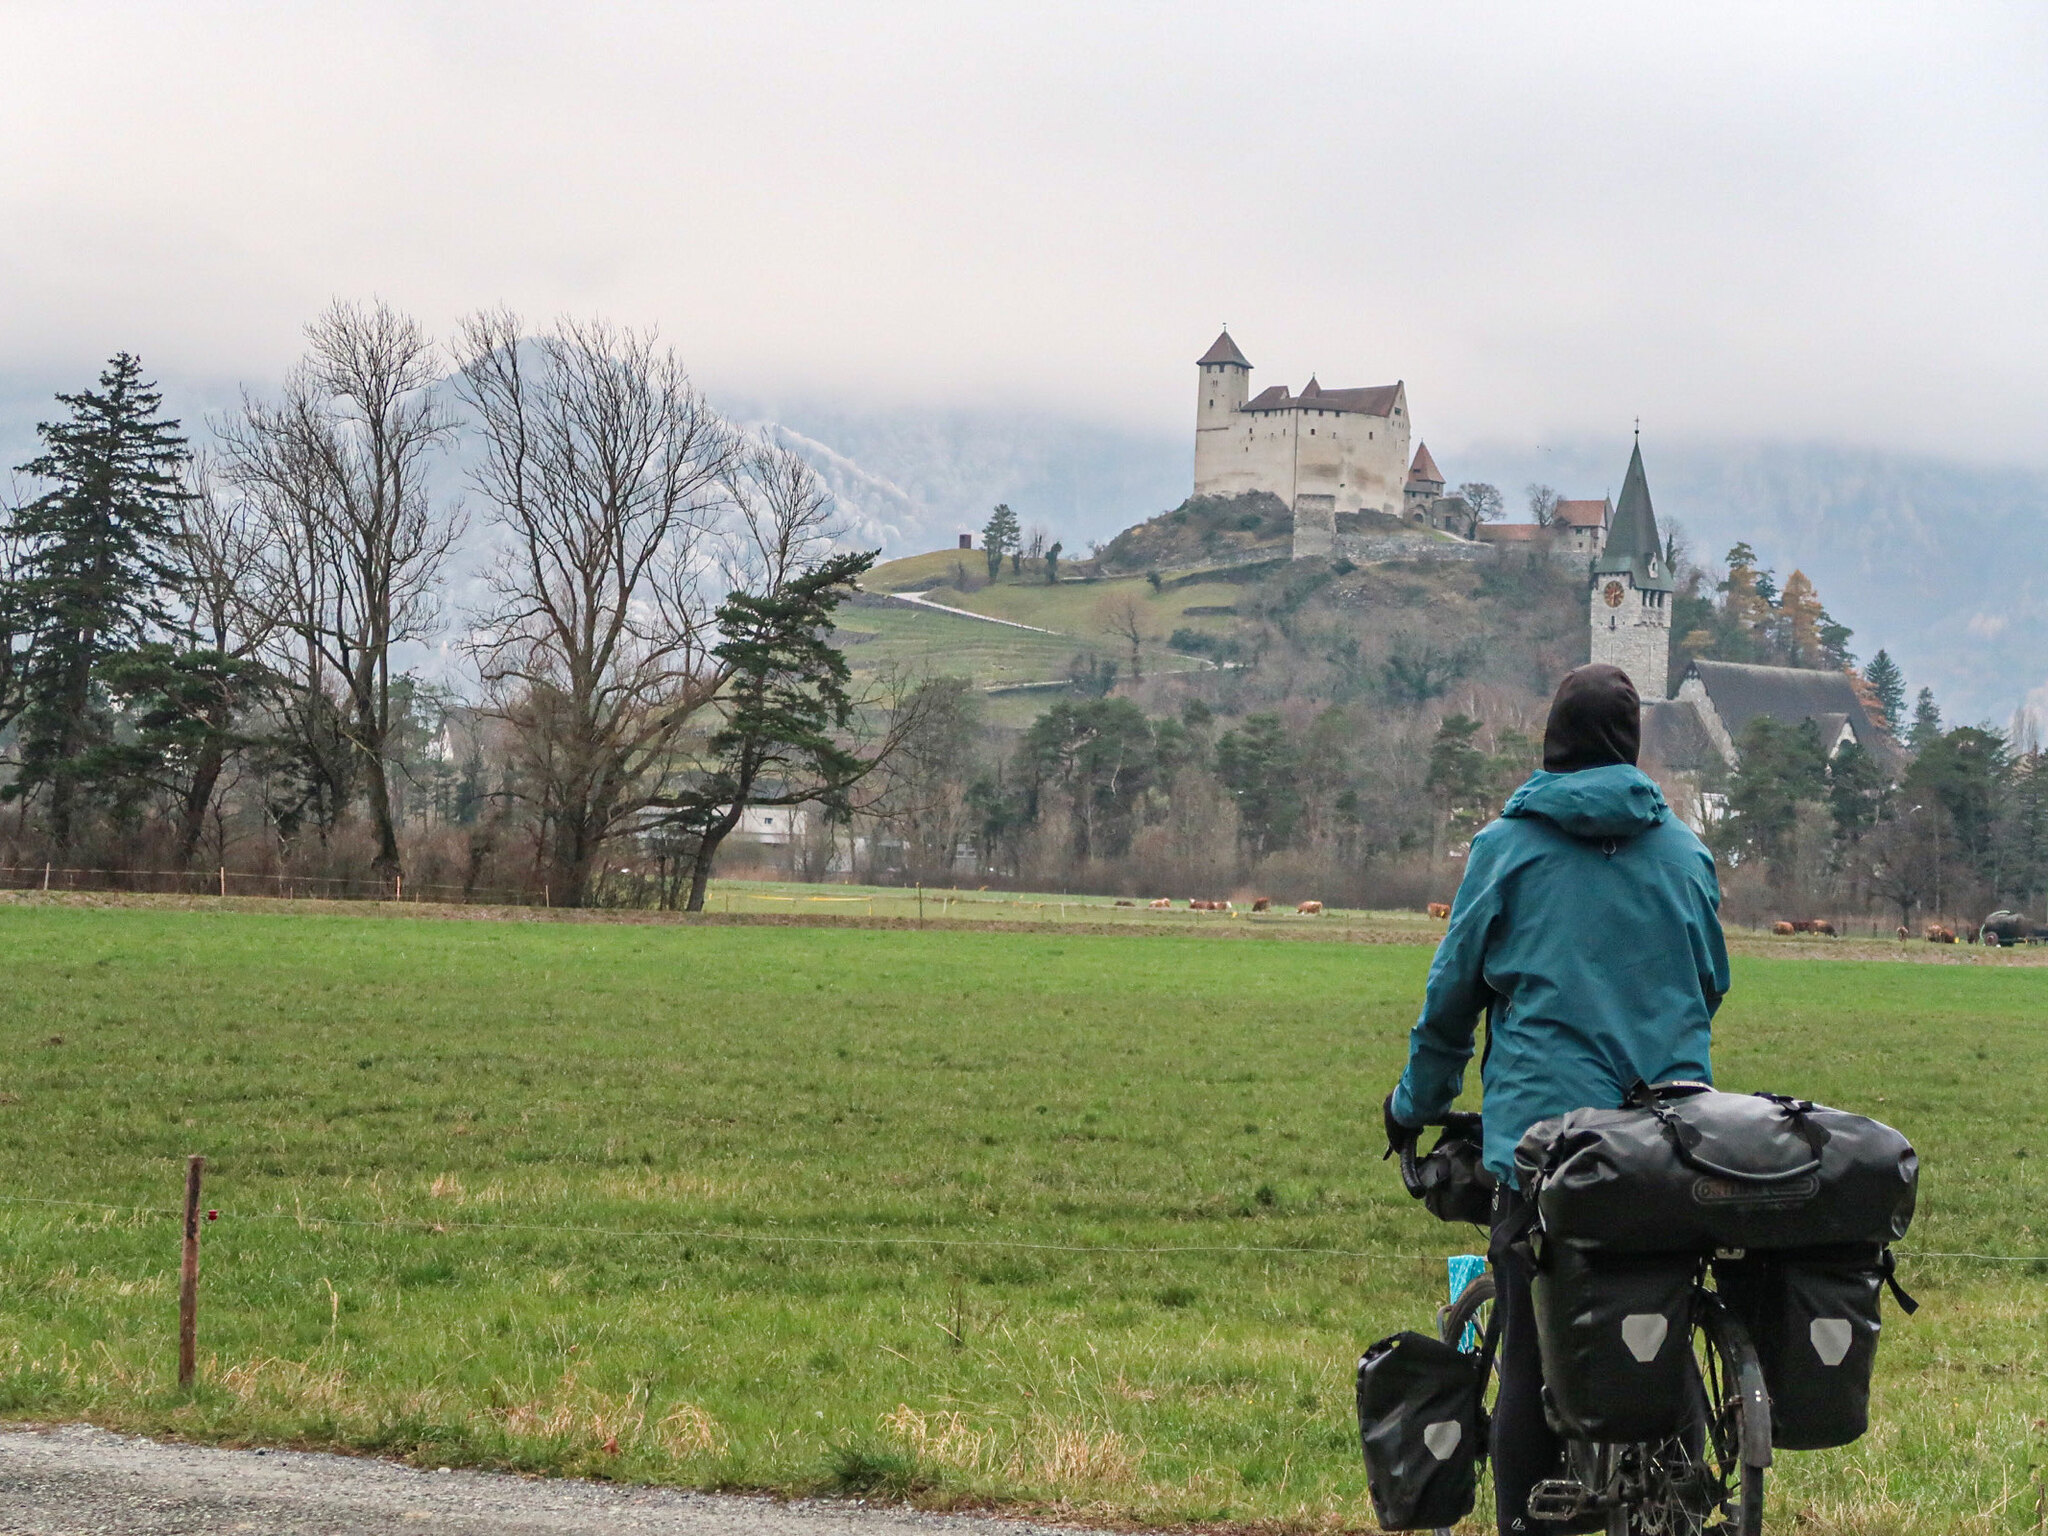 Crossing Liechtenstein